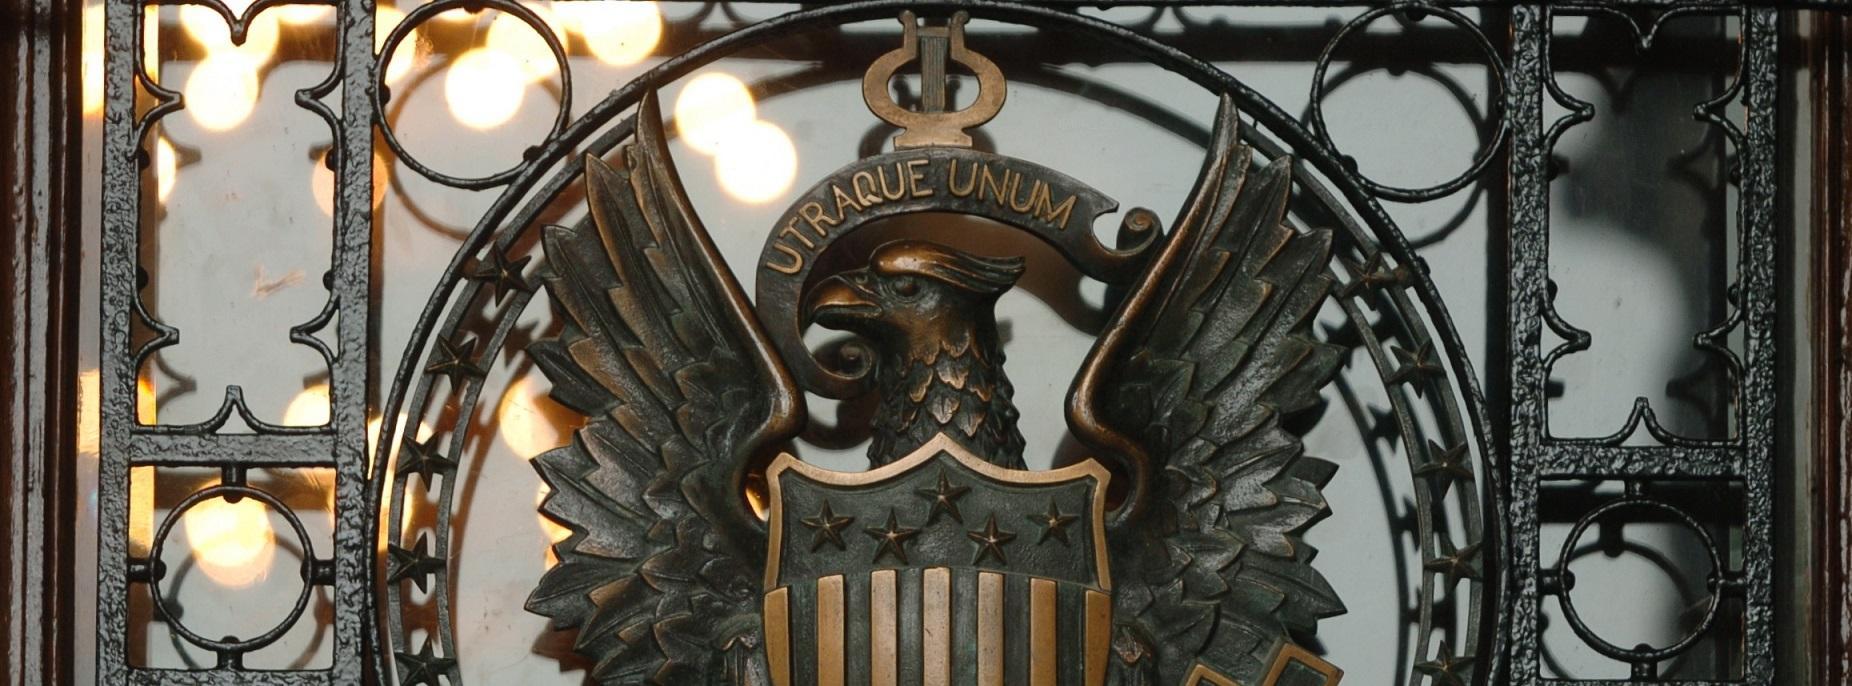 Georgetown Emblem